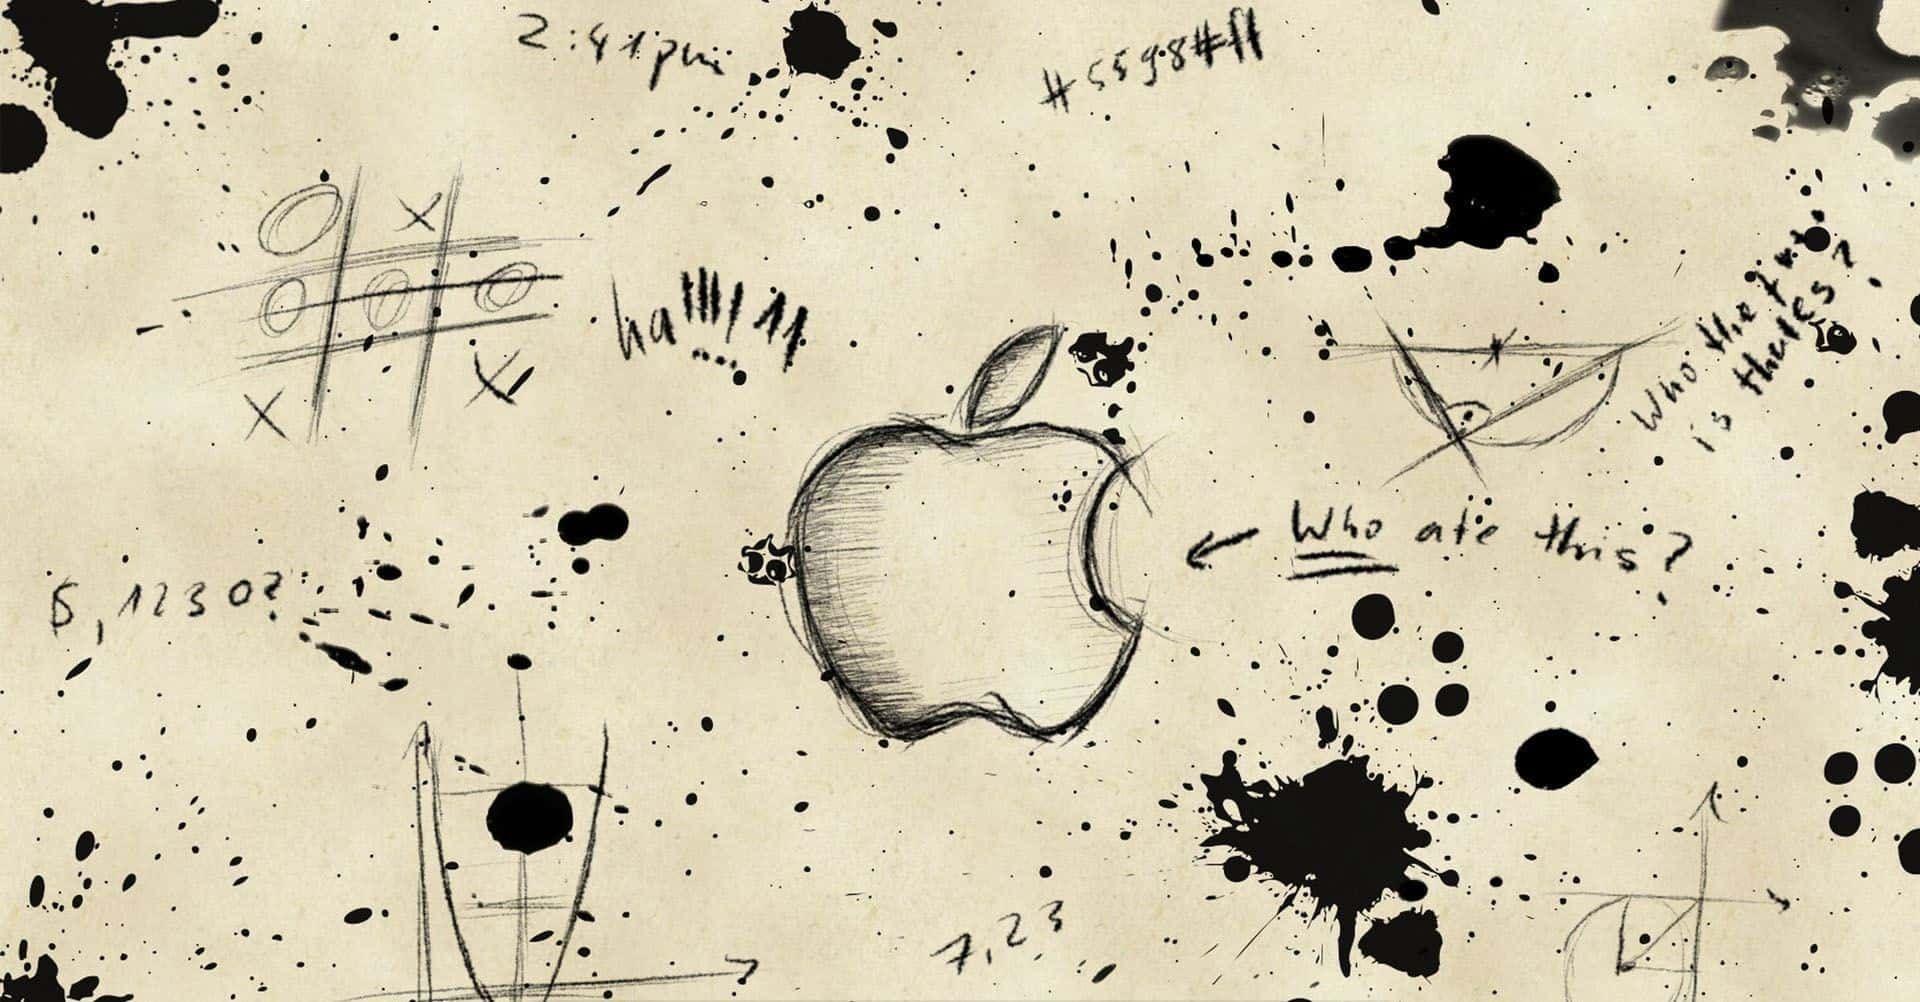 Cool Wallpapers Mac Http Jazzwallpaper Com Cool Wallpapers Mac Hd Wallpapers Apple Logo Wallpaper Apple Sketch Cool Hd Wallpapers